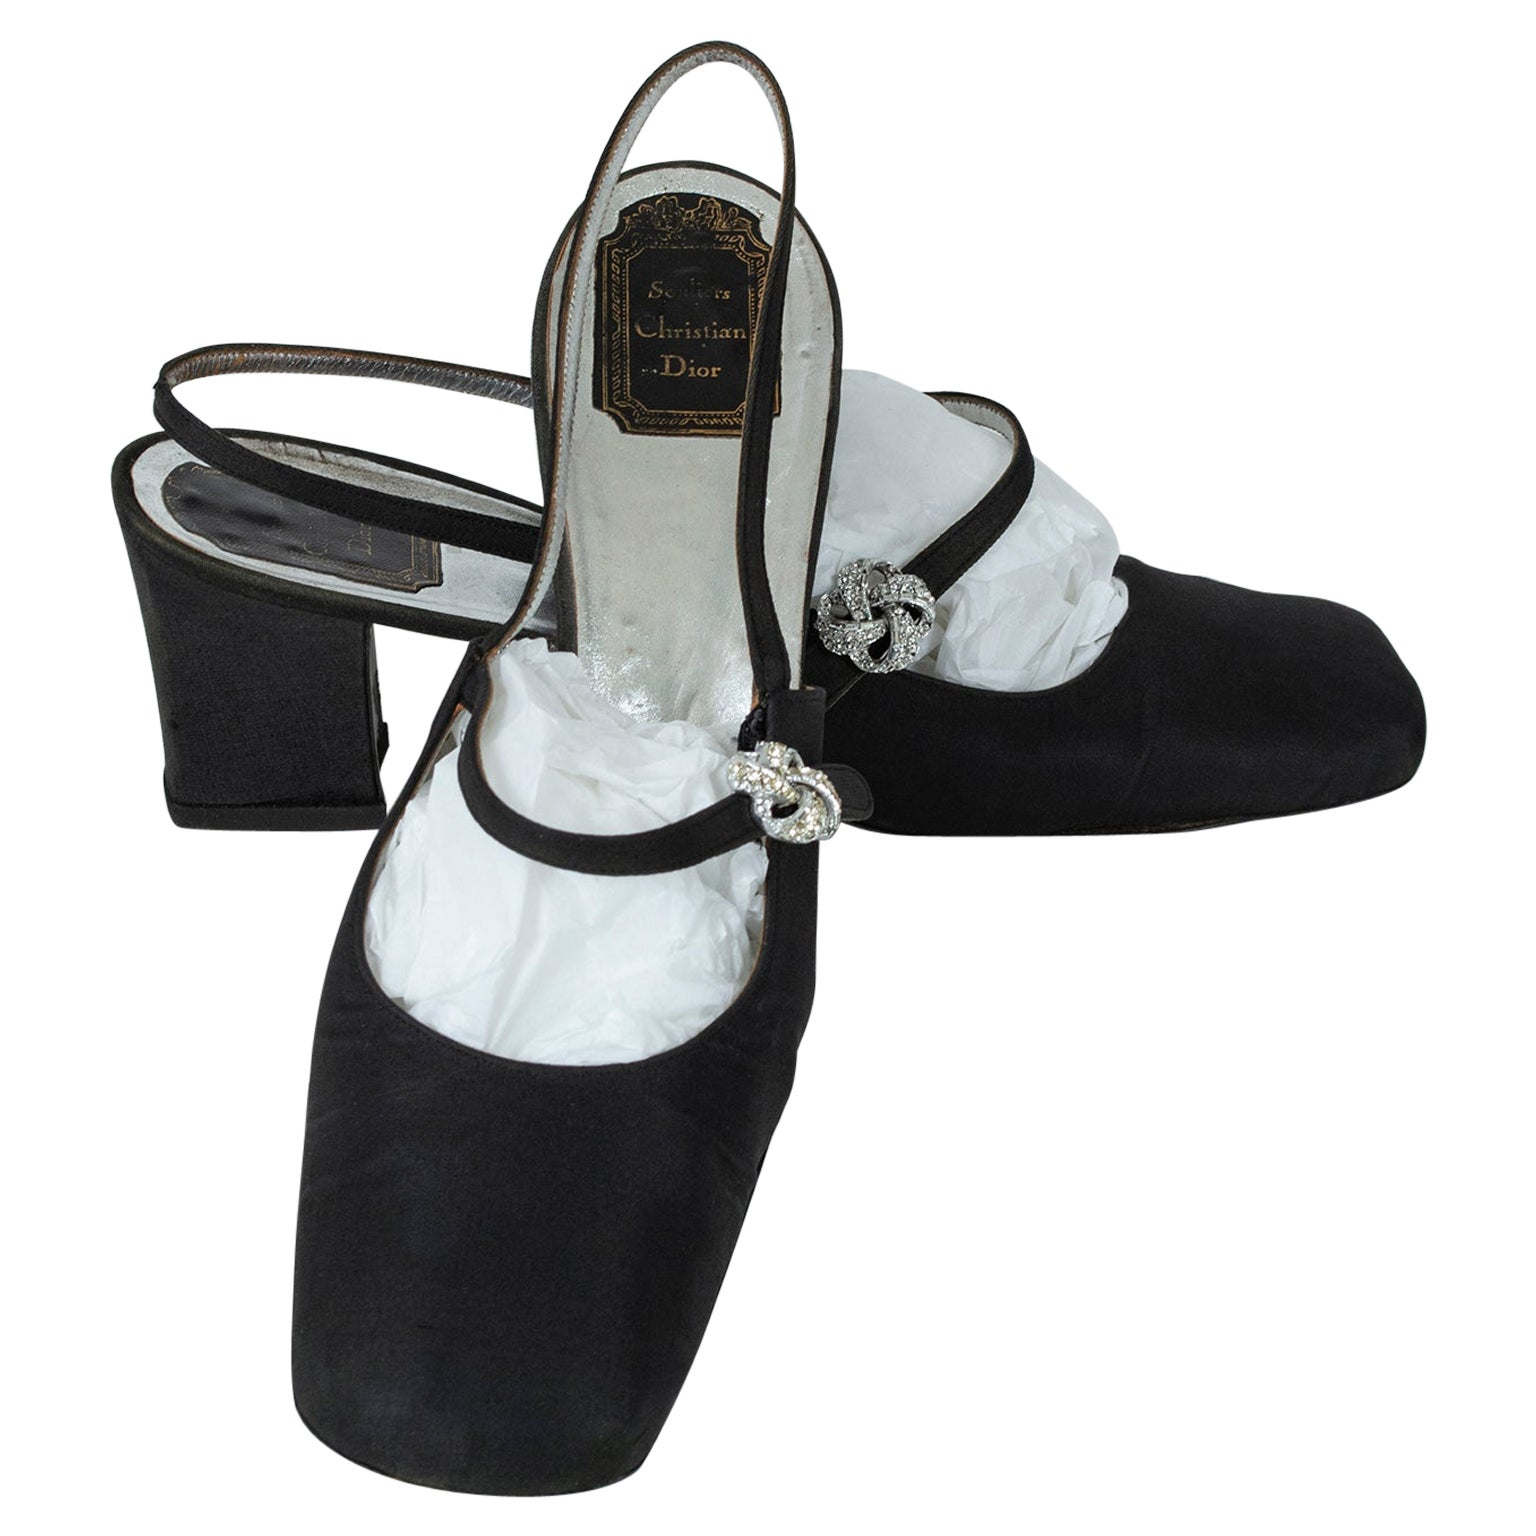 Black Souliers Christian Dior Jeweled Slingback Evening Sandal – US 10, 1960s